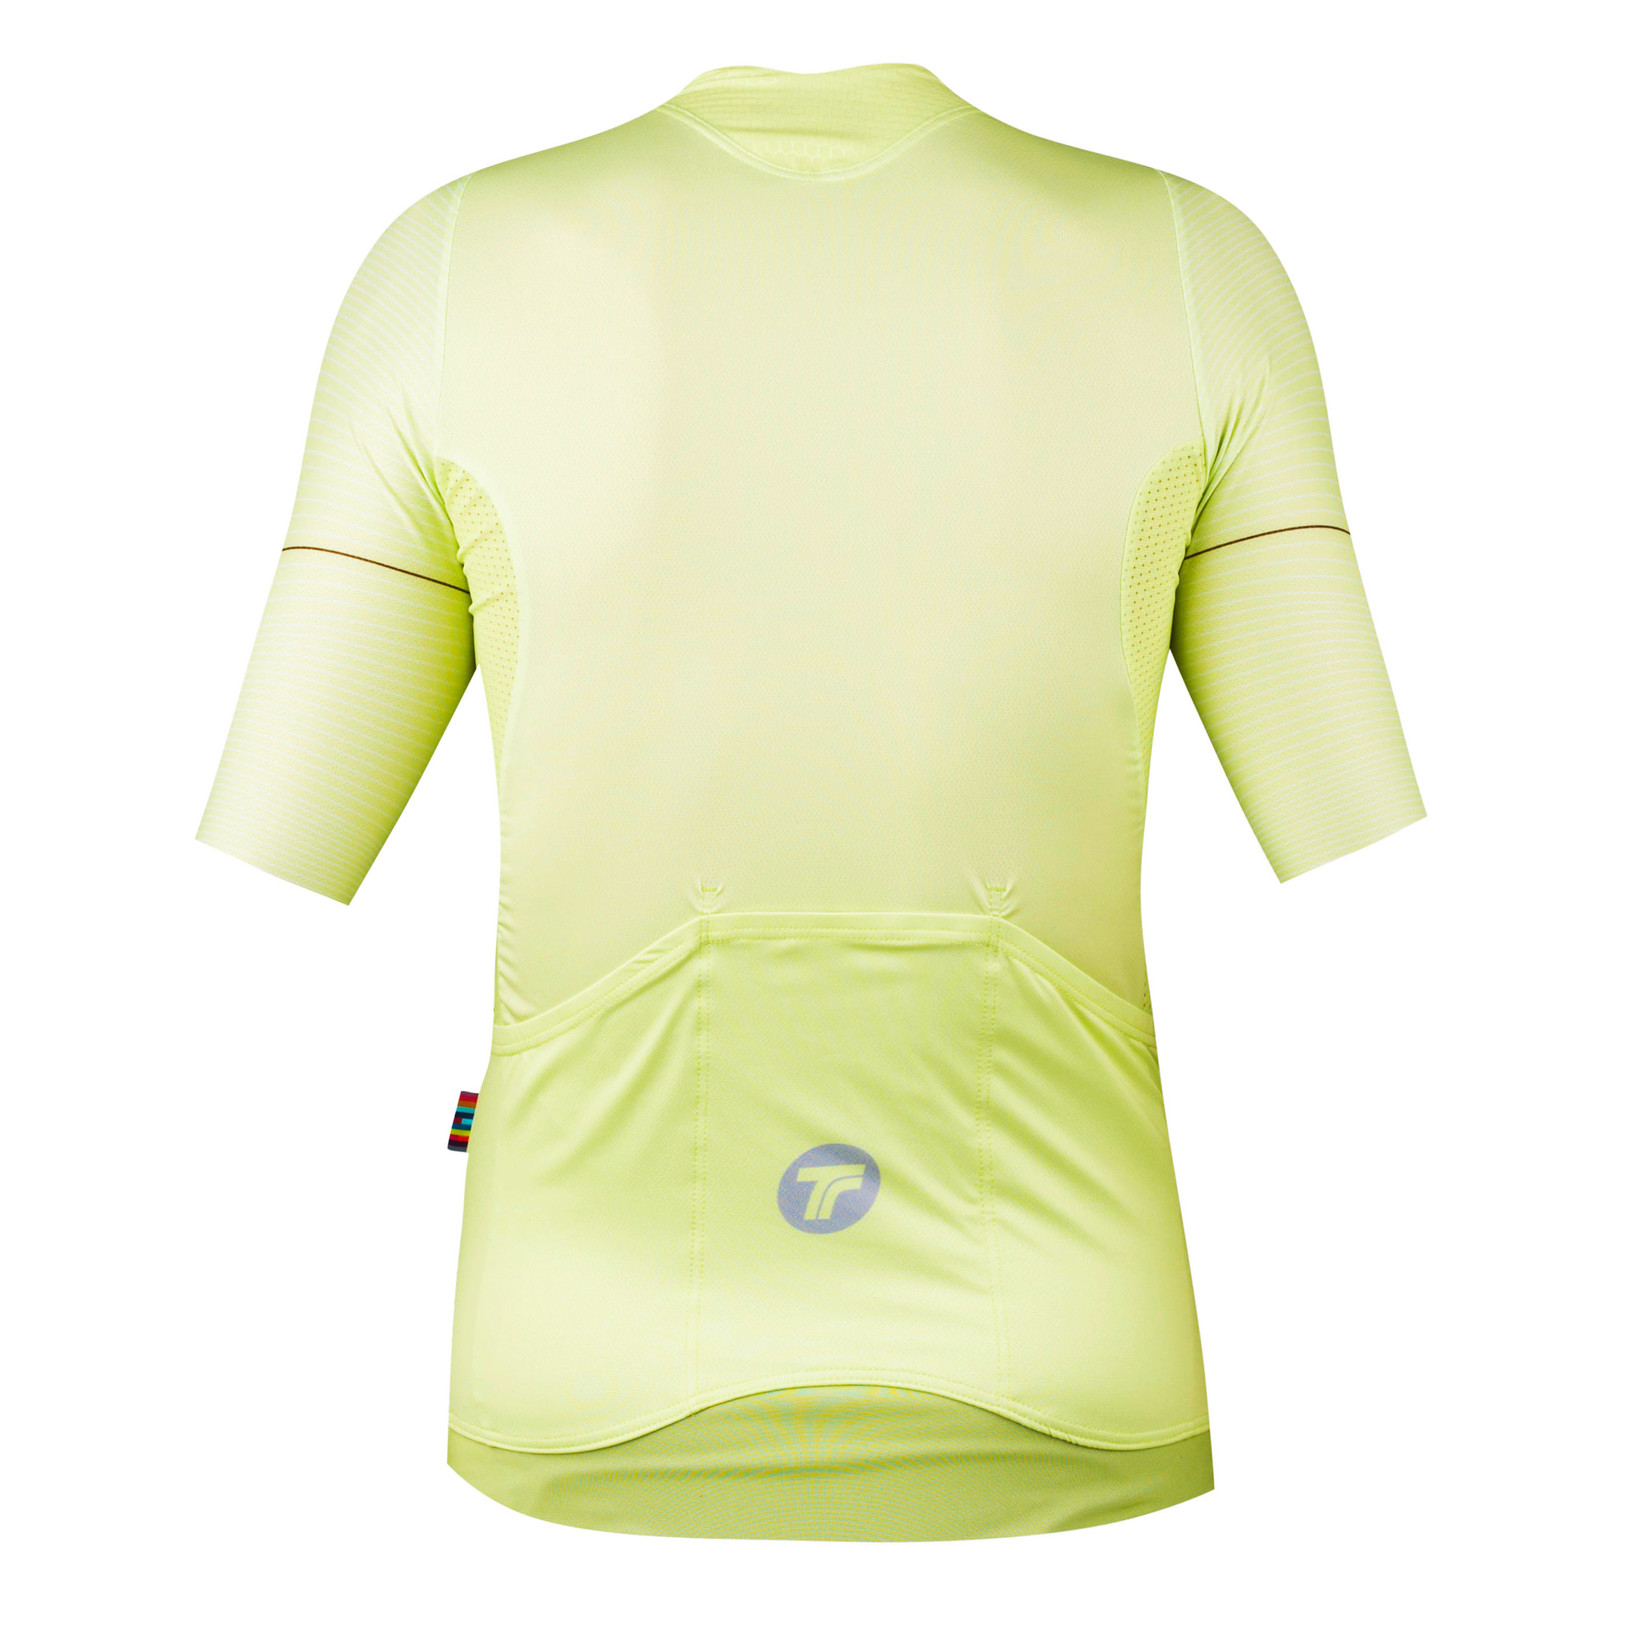 Tactic TACTIC Short Sleeve Jersey Signature - Silverlake